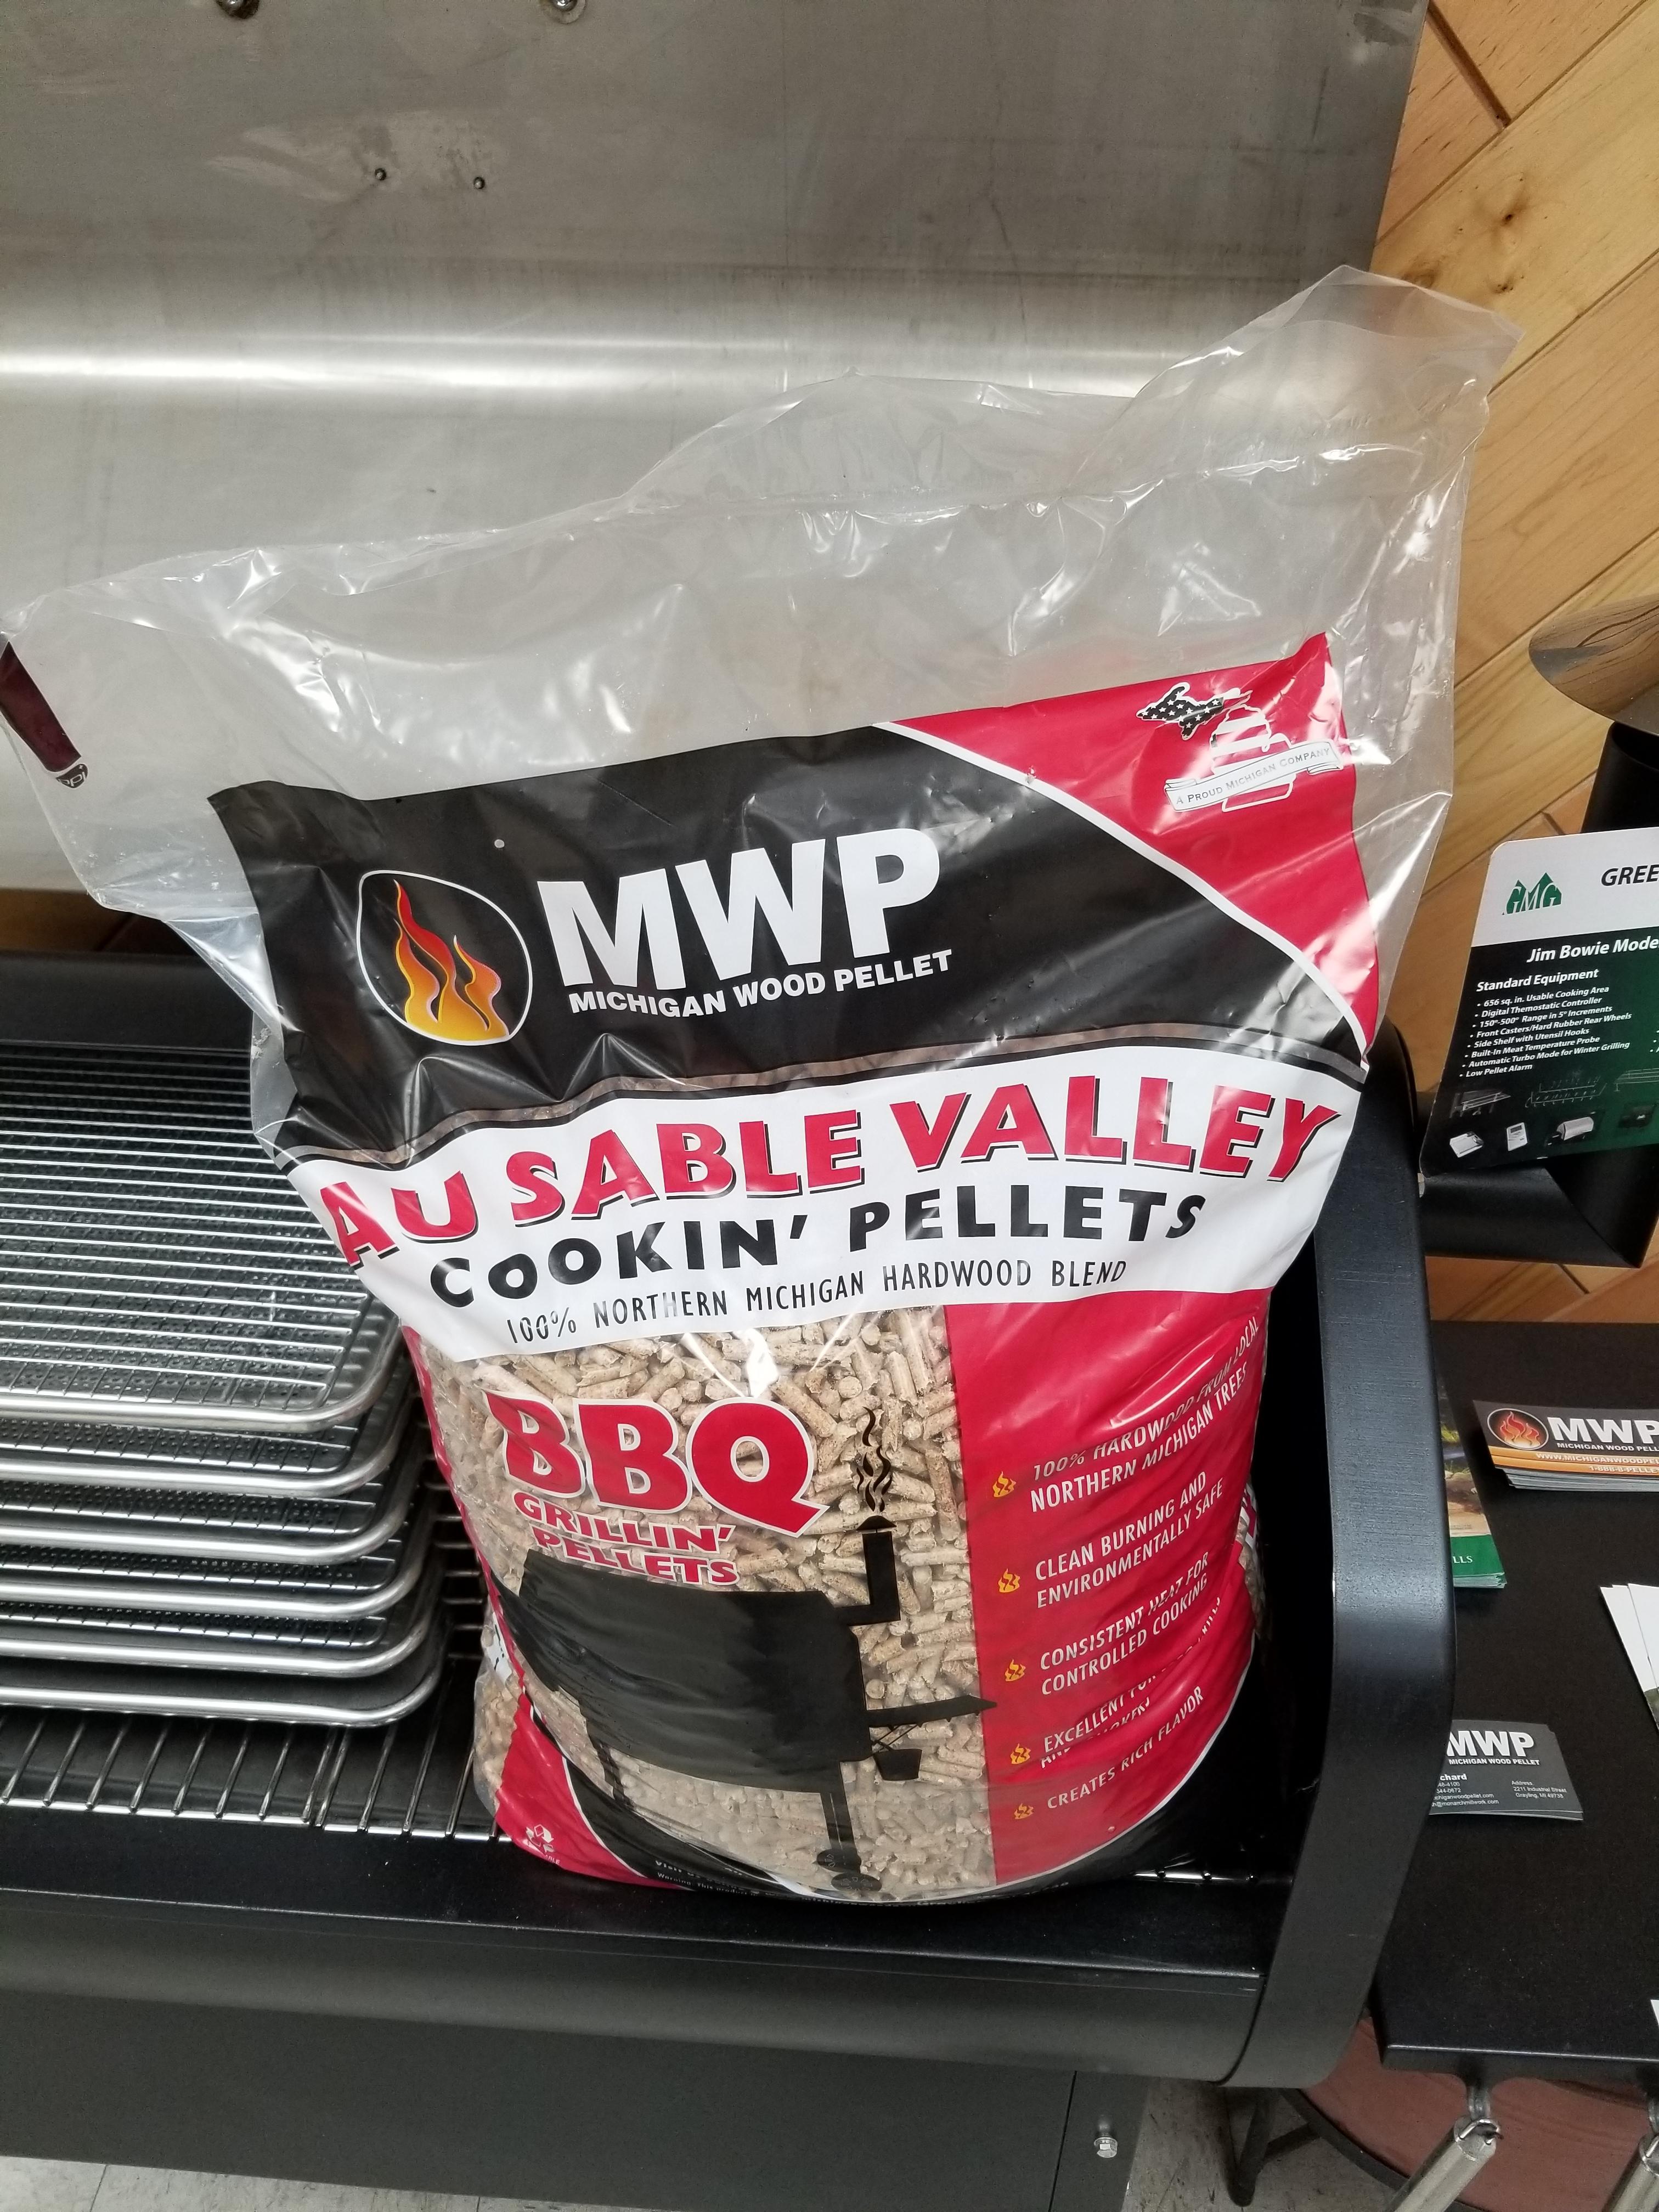 Ausable Valley Cooking Pellets Michigan Wood Pellet